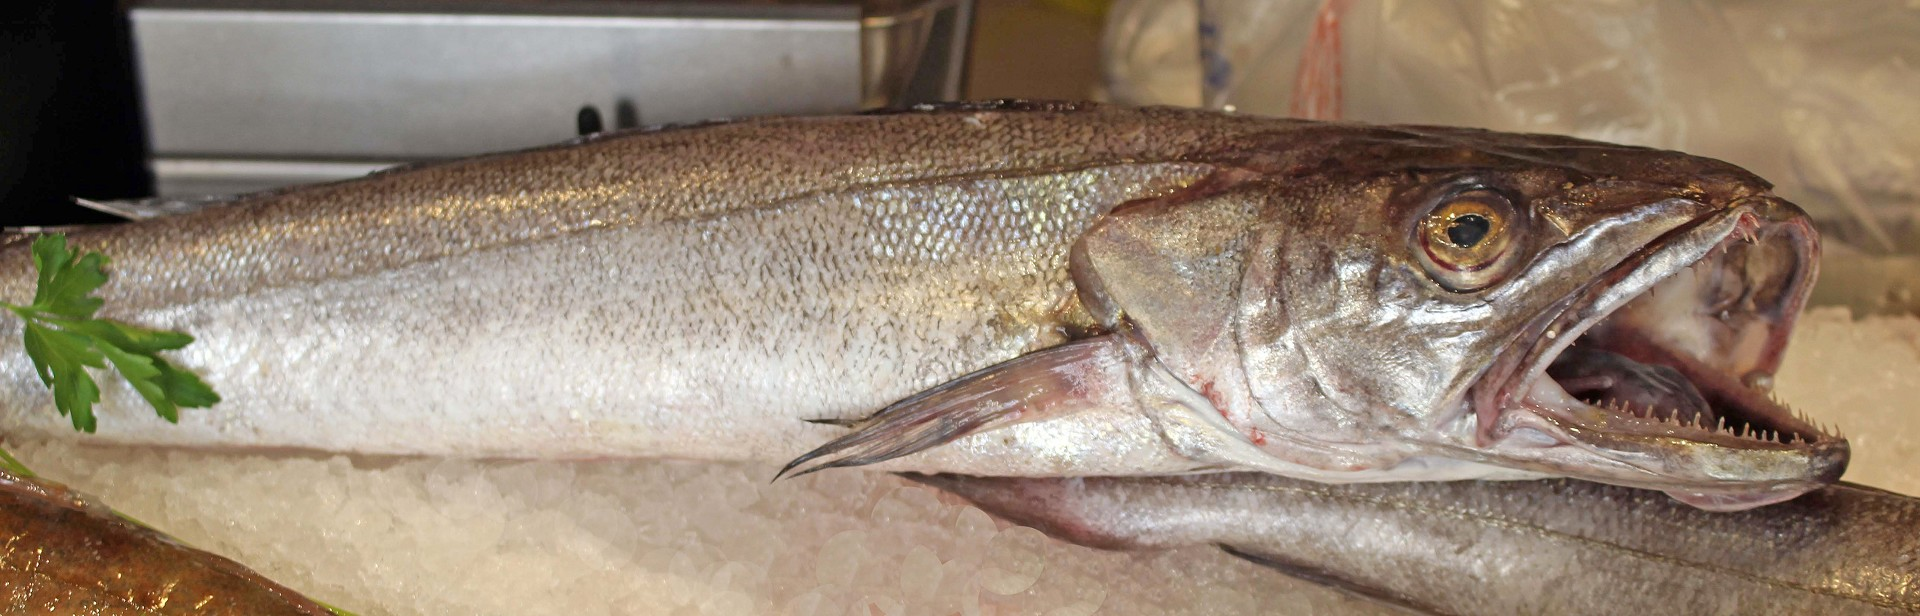 Stefano pescherie nasello cucinare nasello pesce per for Comprare pesci online